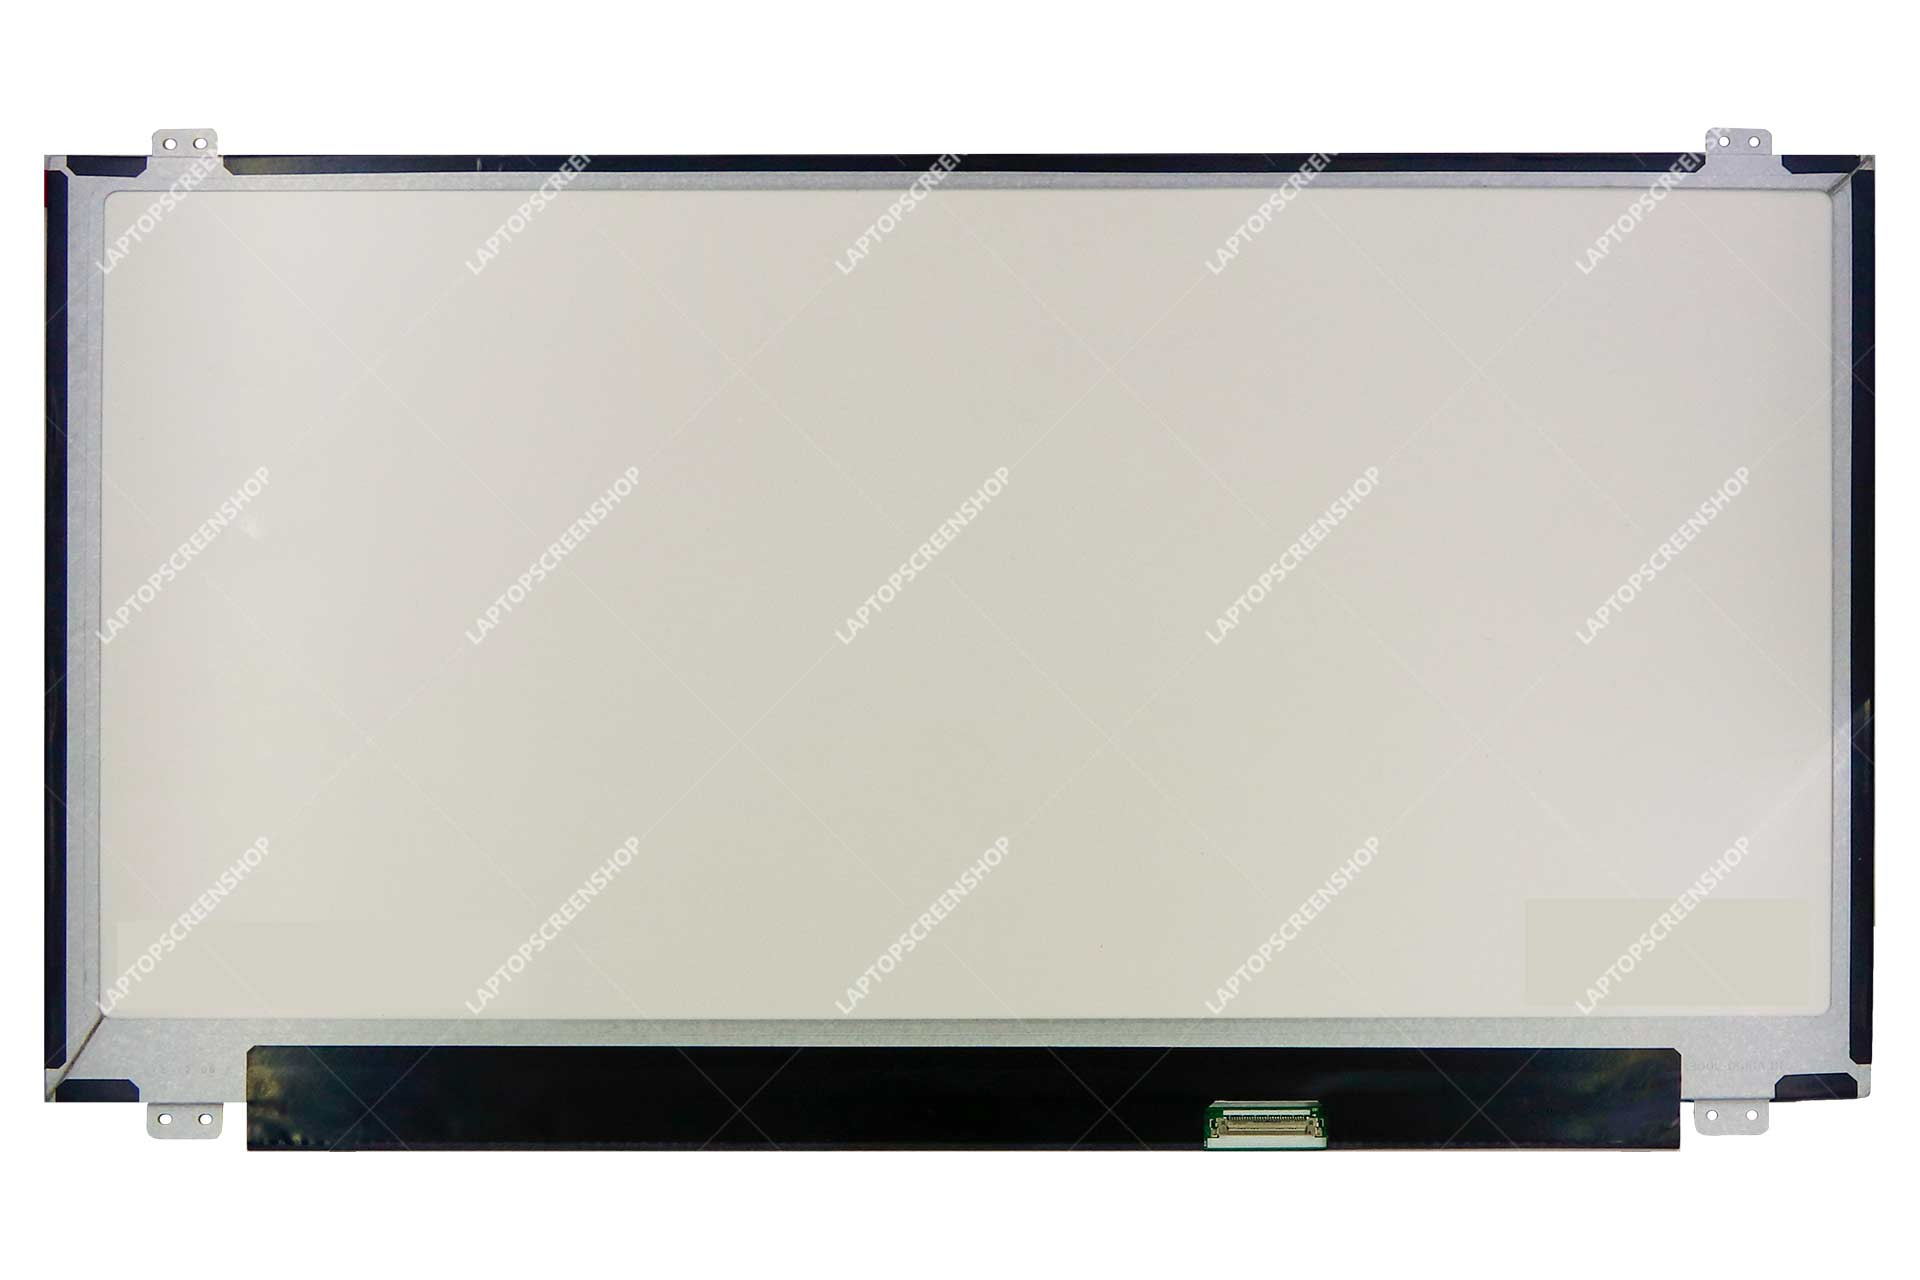 ACER-ASPIRE-E1-522-5460-LCD |HD|فروشگاه لپ تاپ اسکرين | تعمير لپ تاپ